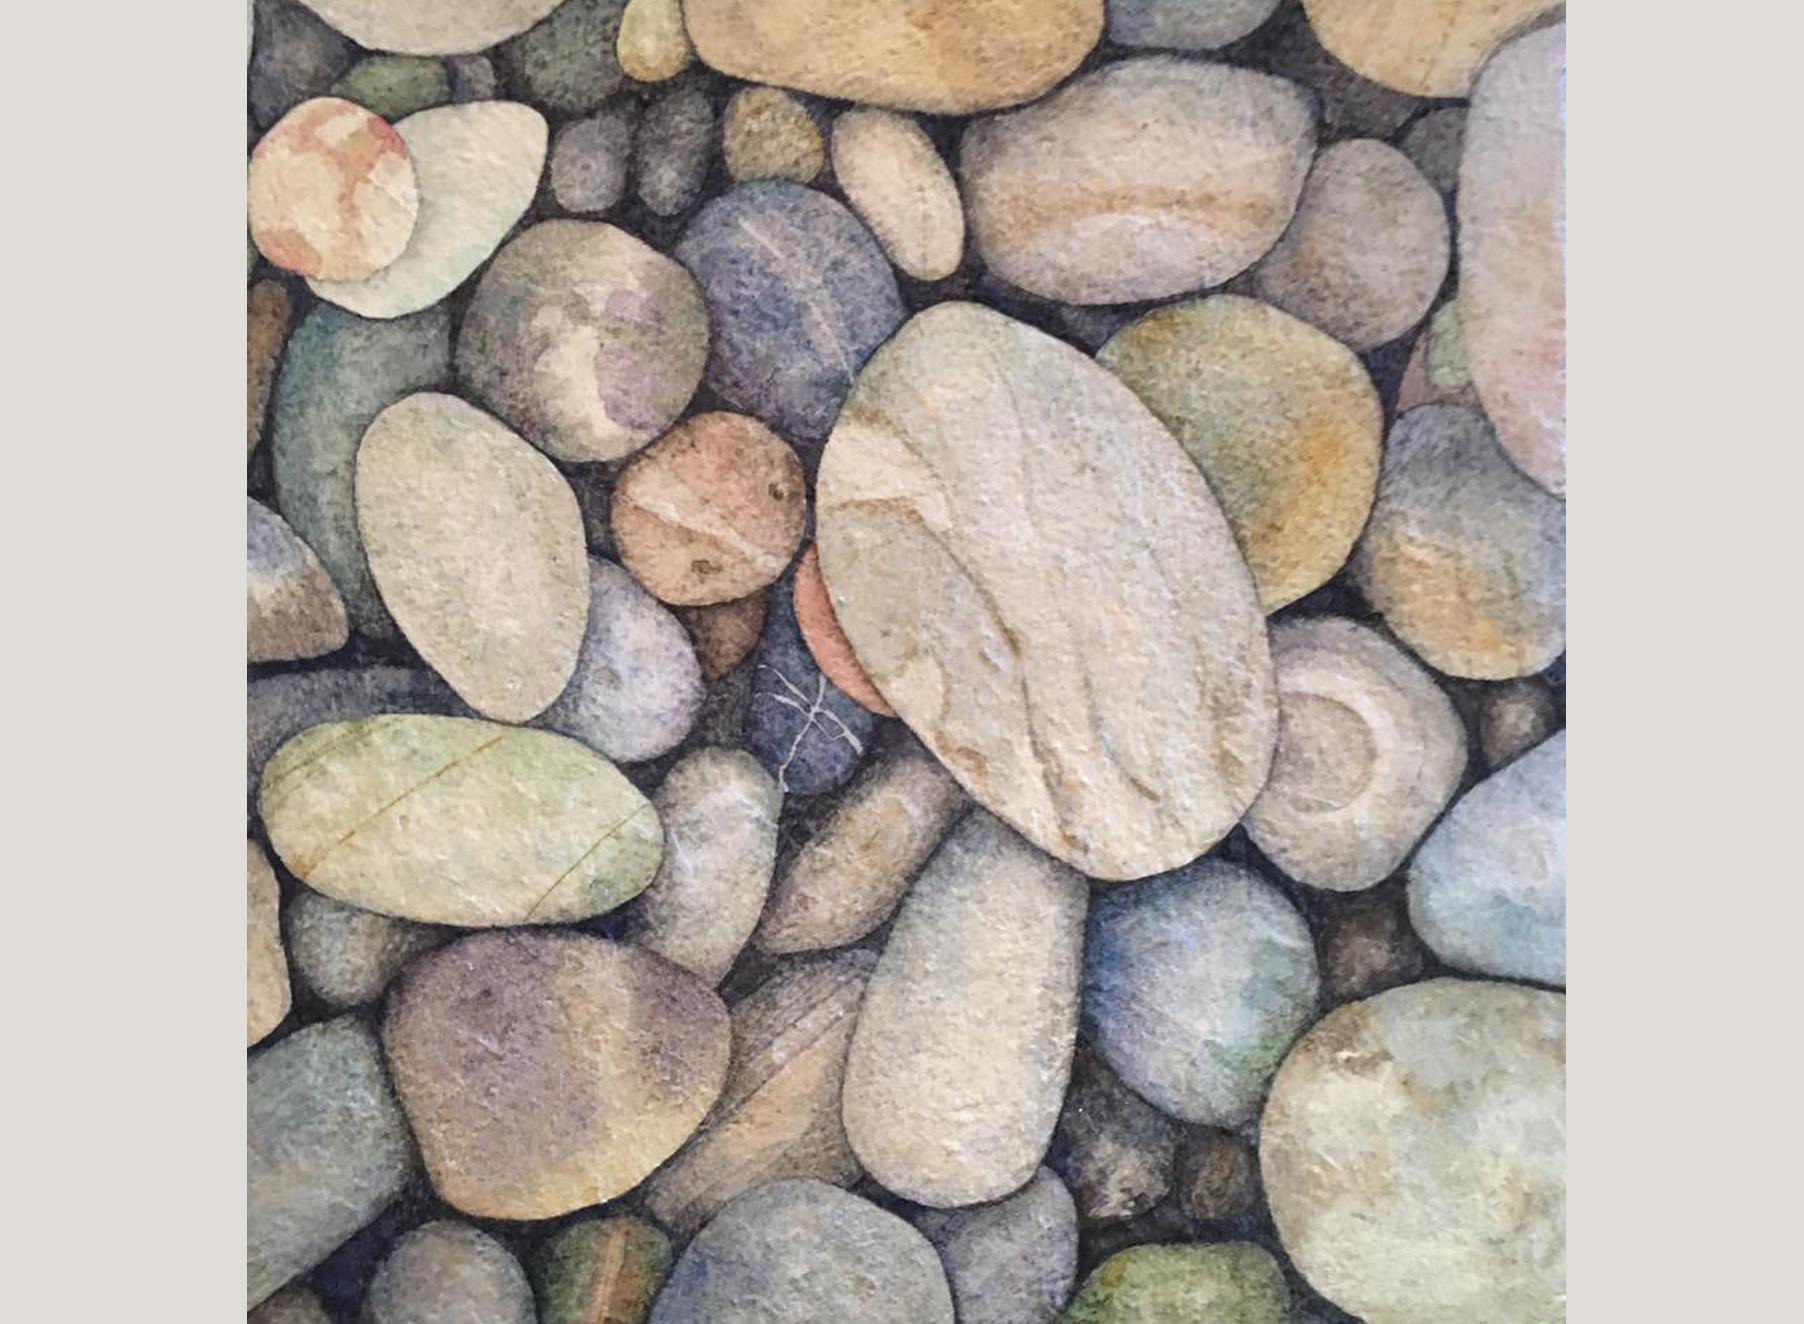 Tumbled Beach Pebbles I